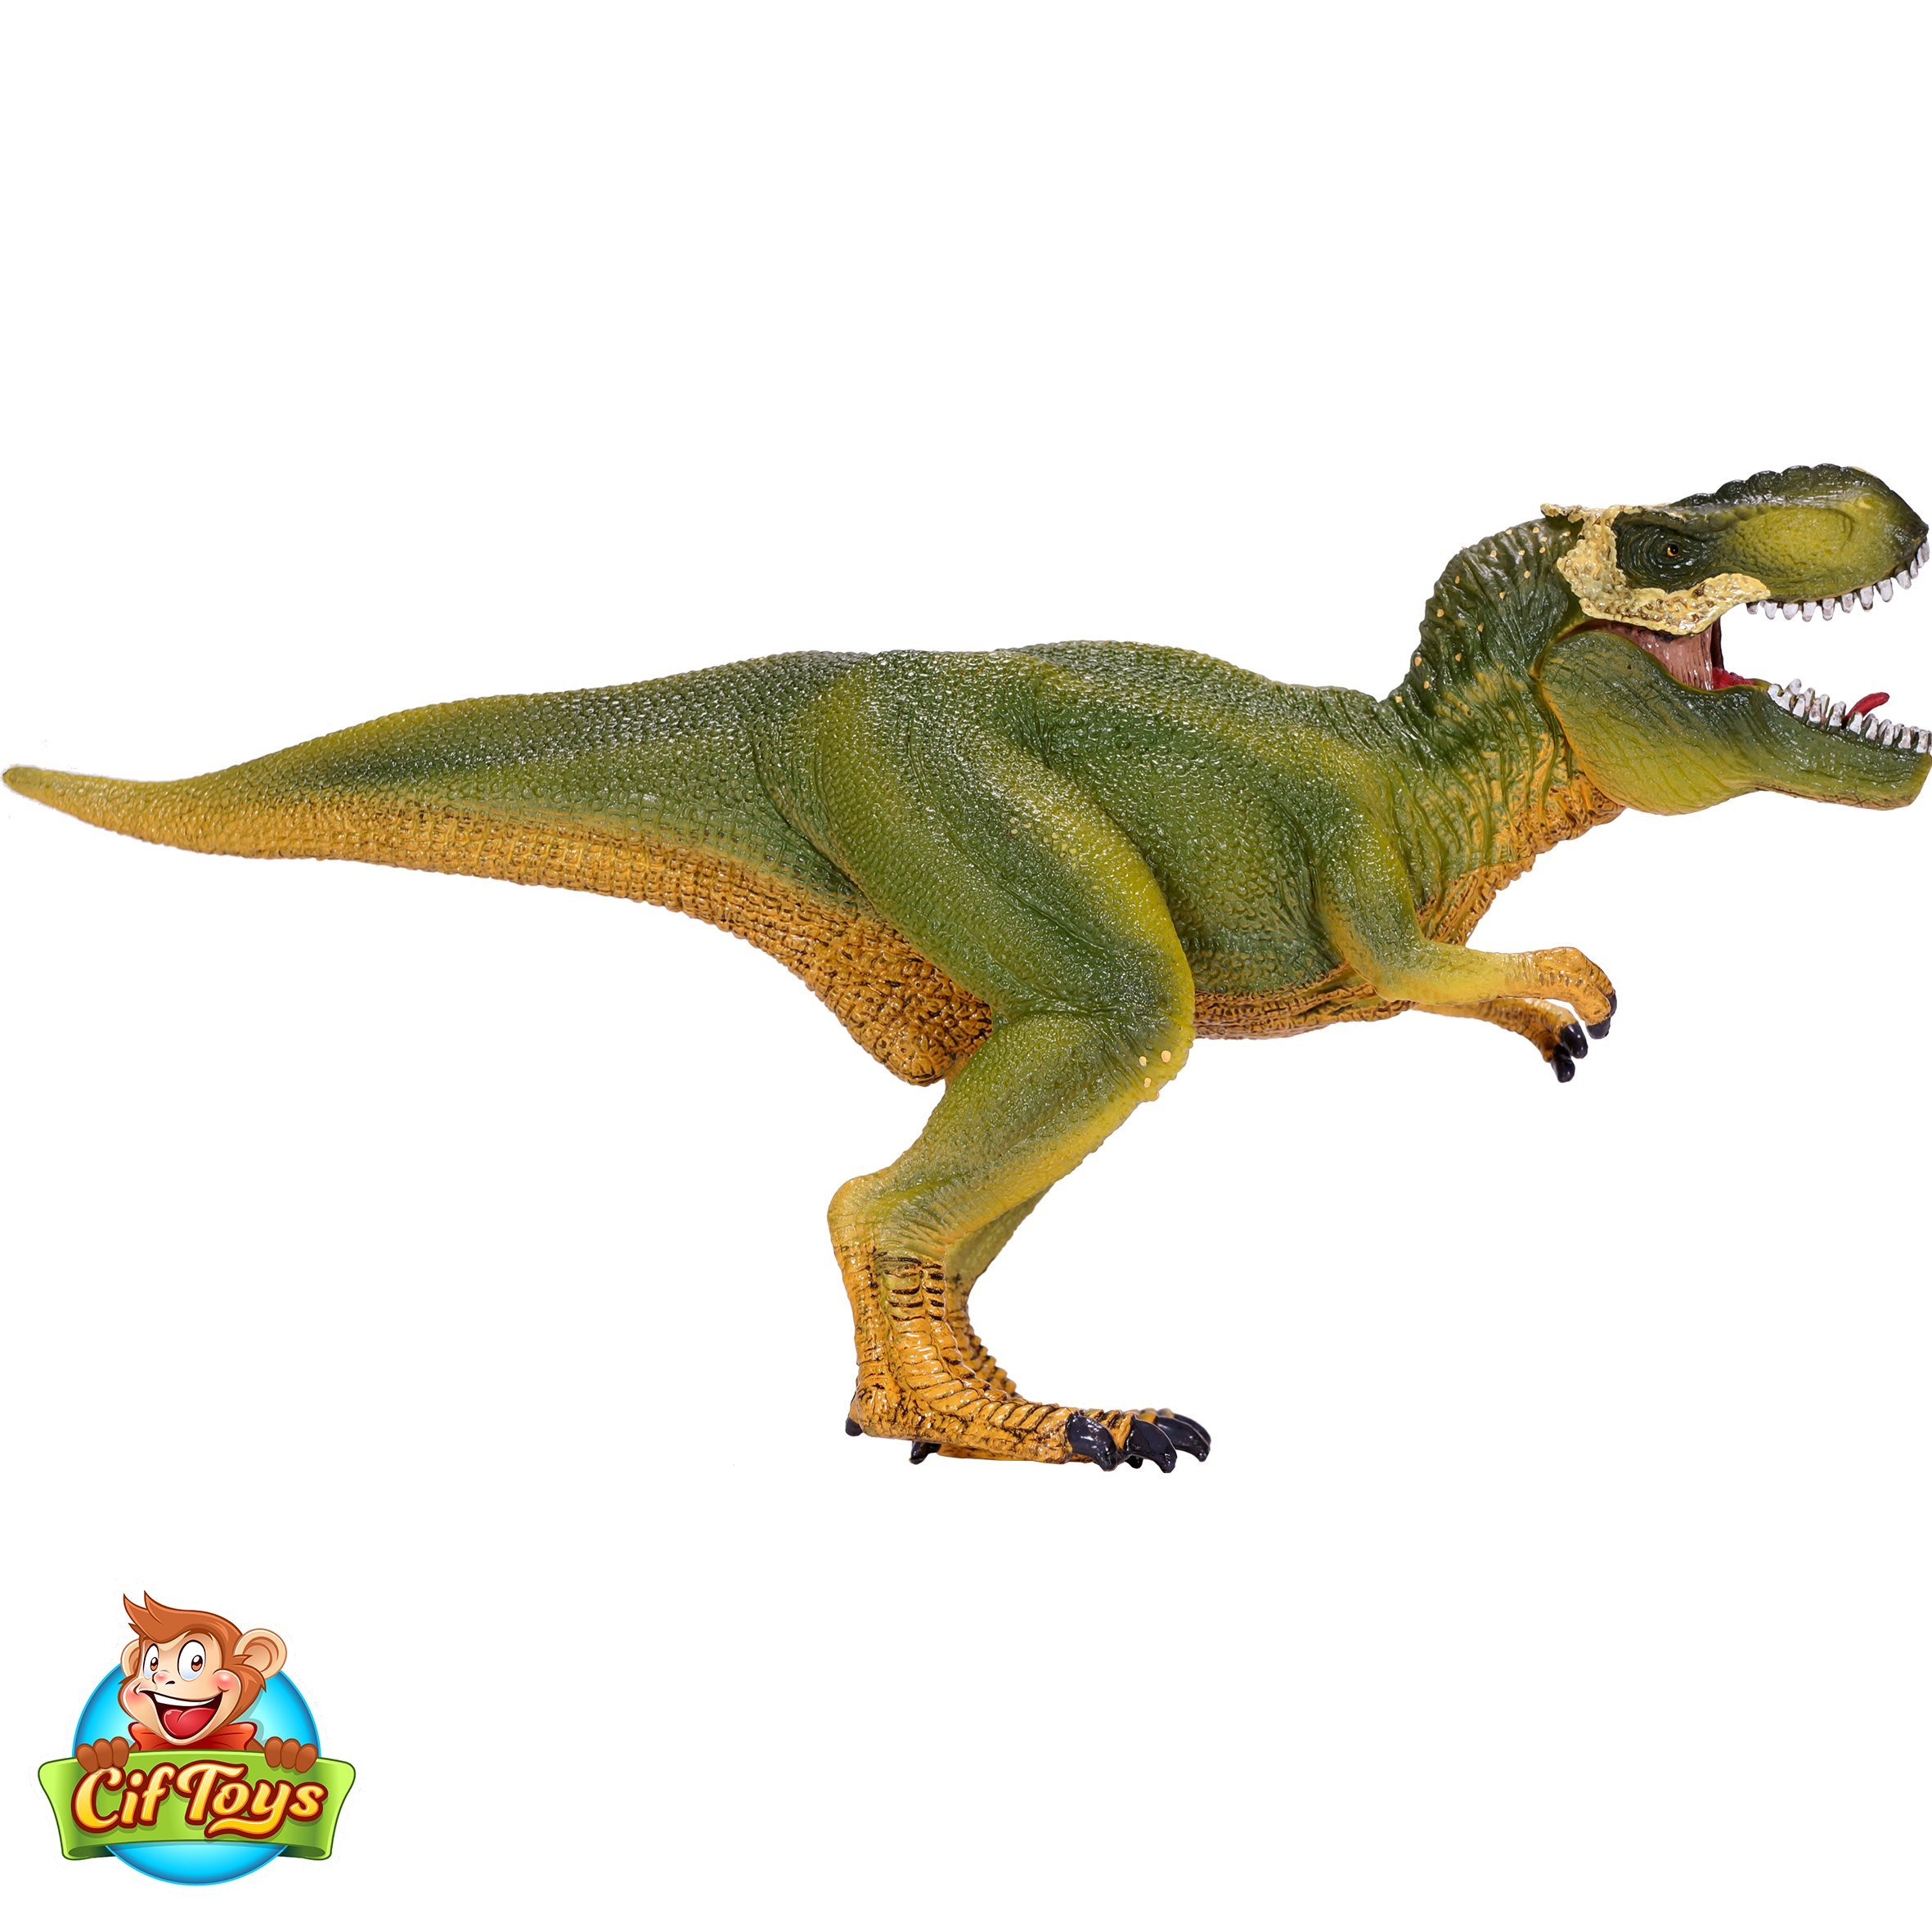 CifToys Realistic Tyrannosaurus Rex T T T-Rex Dinosaur Toys Kids Toy Jurassic   eBay